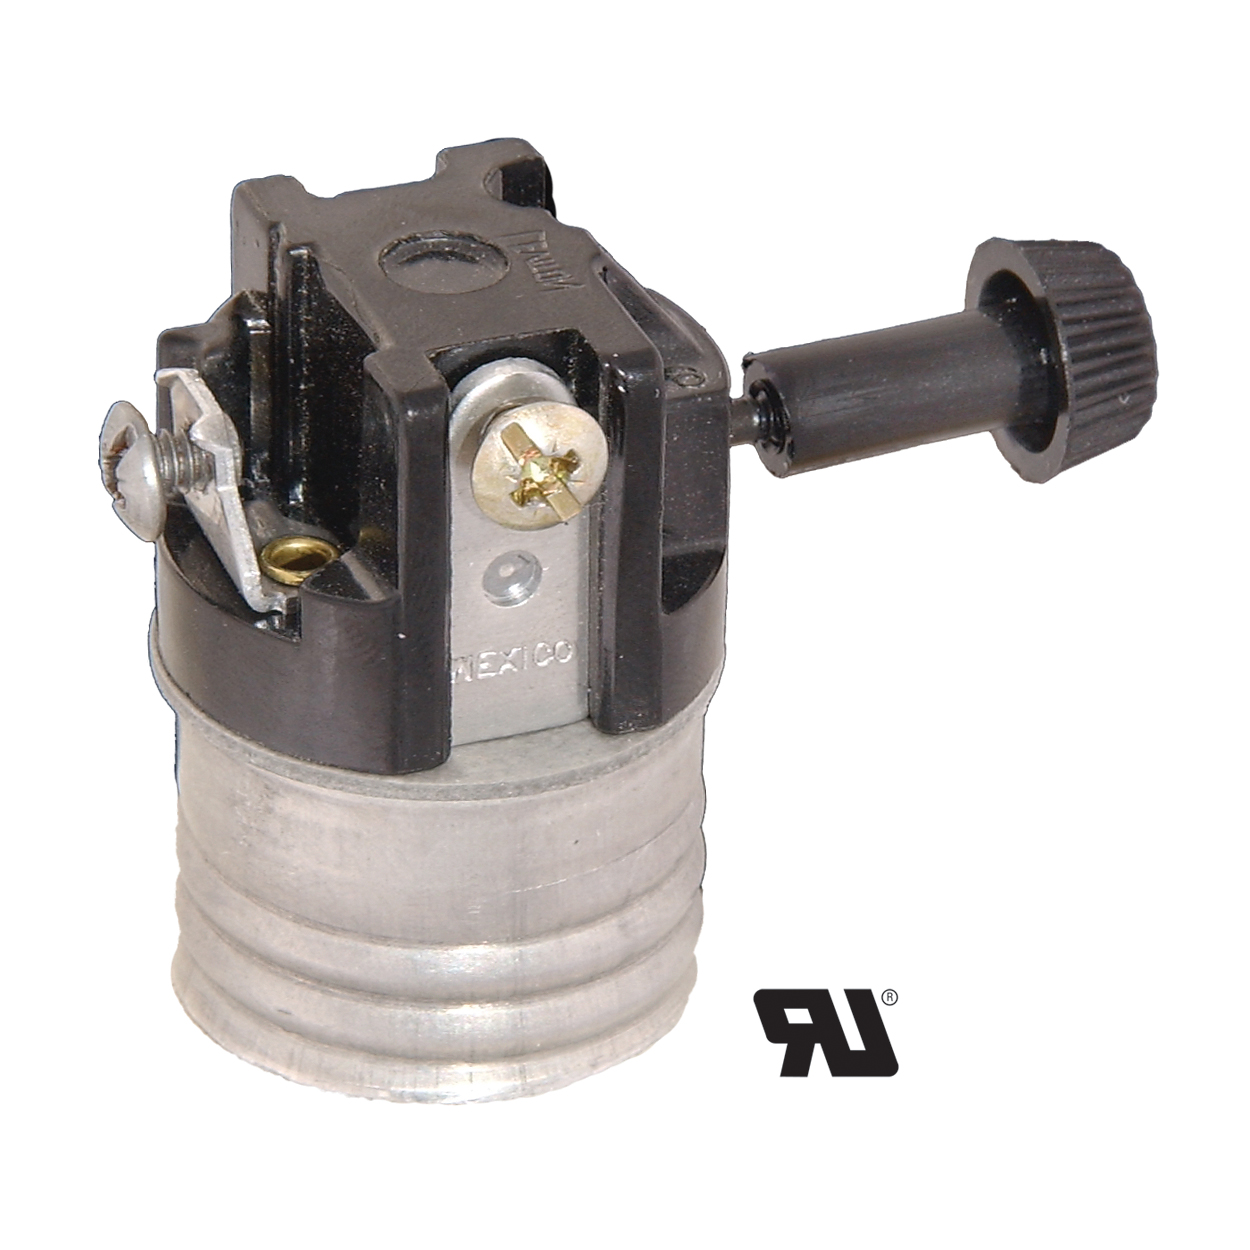 Lamp Socket Wiring Diagram Todays A Light Leviton Brand Three Terminal Turn Knob Interior For 48206